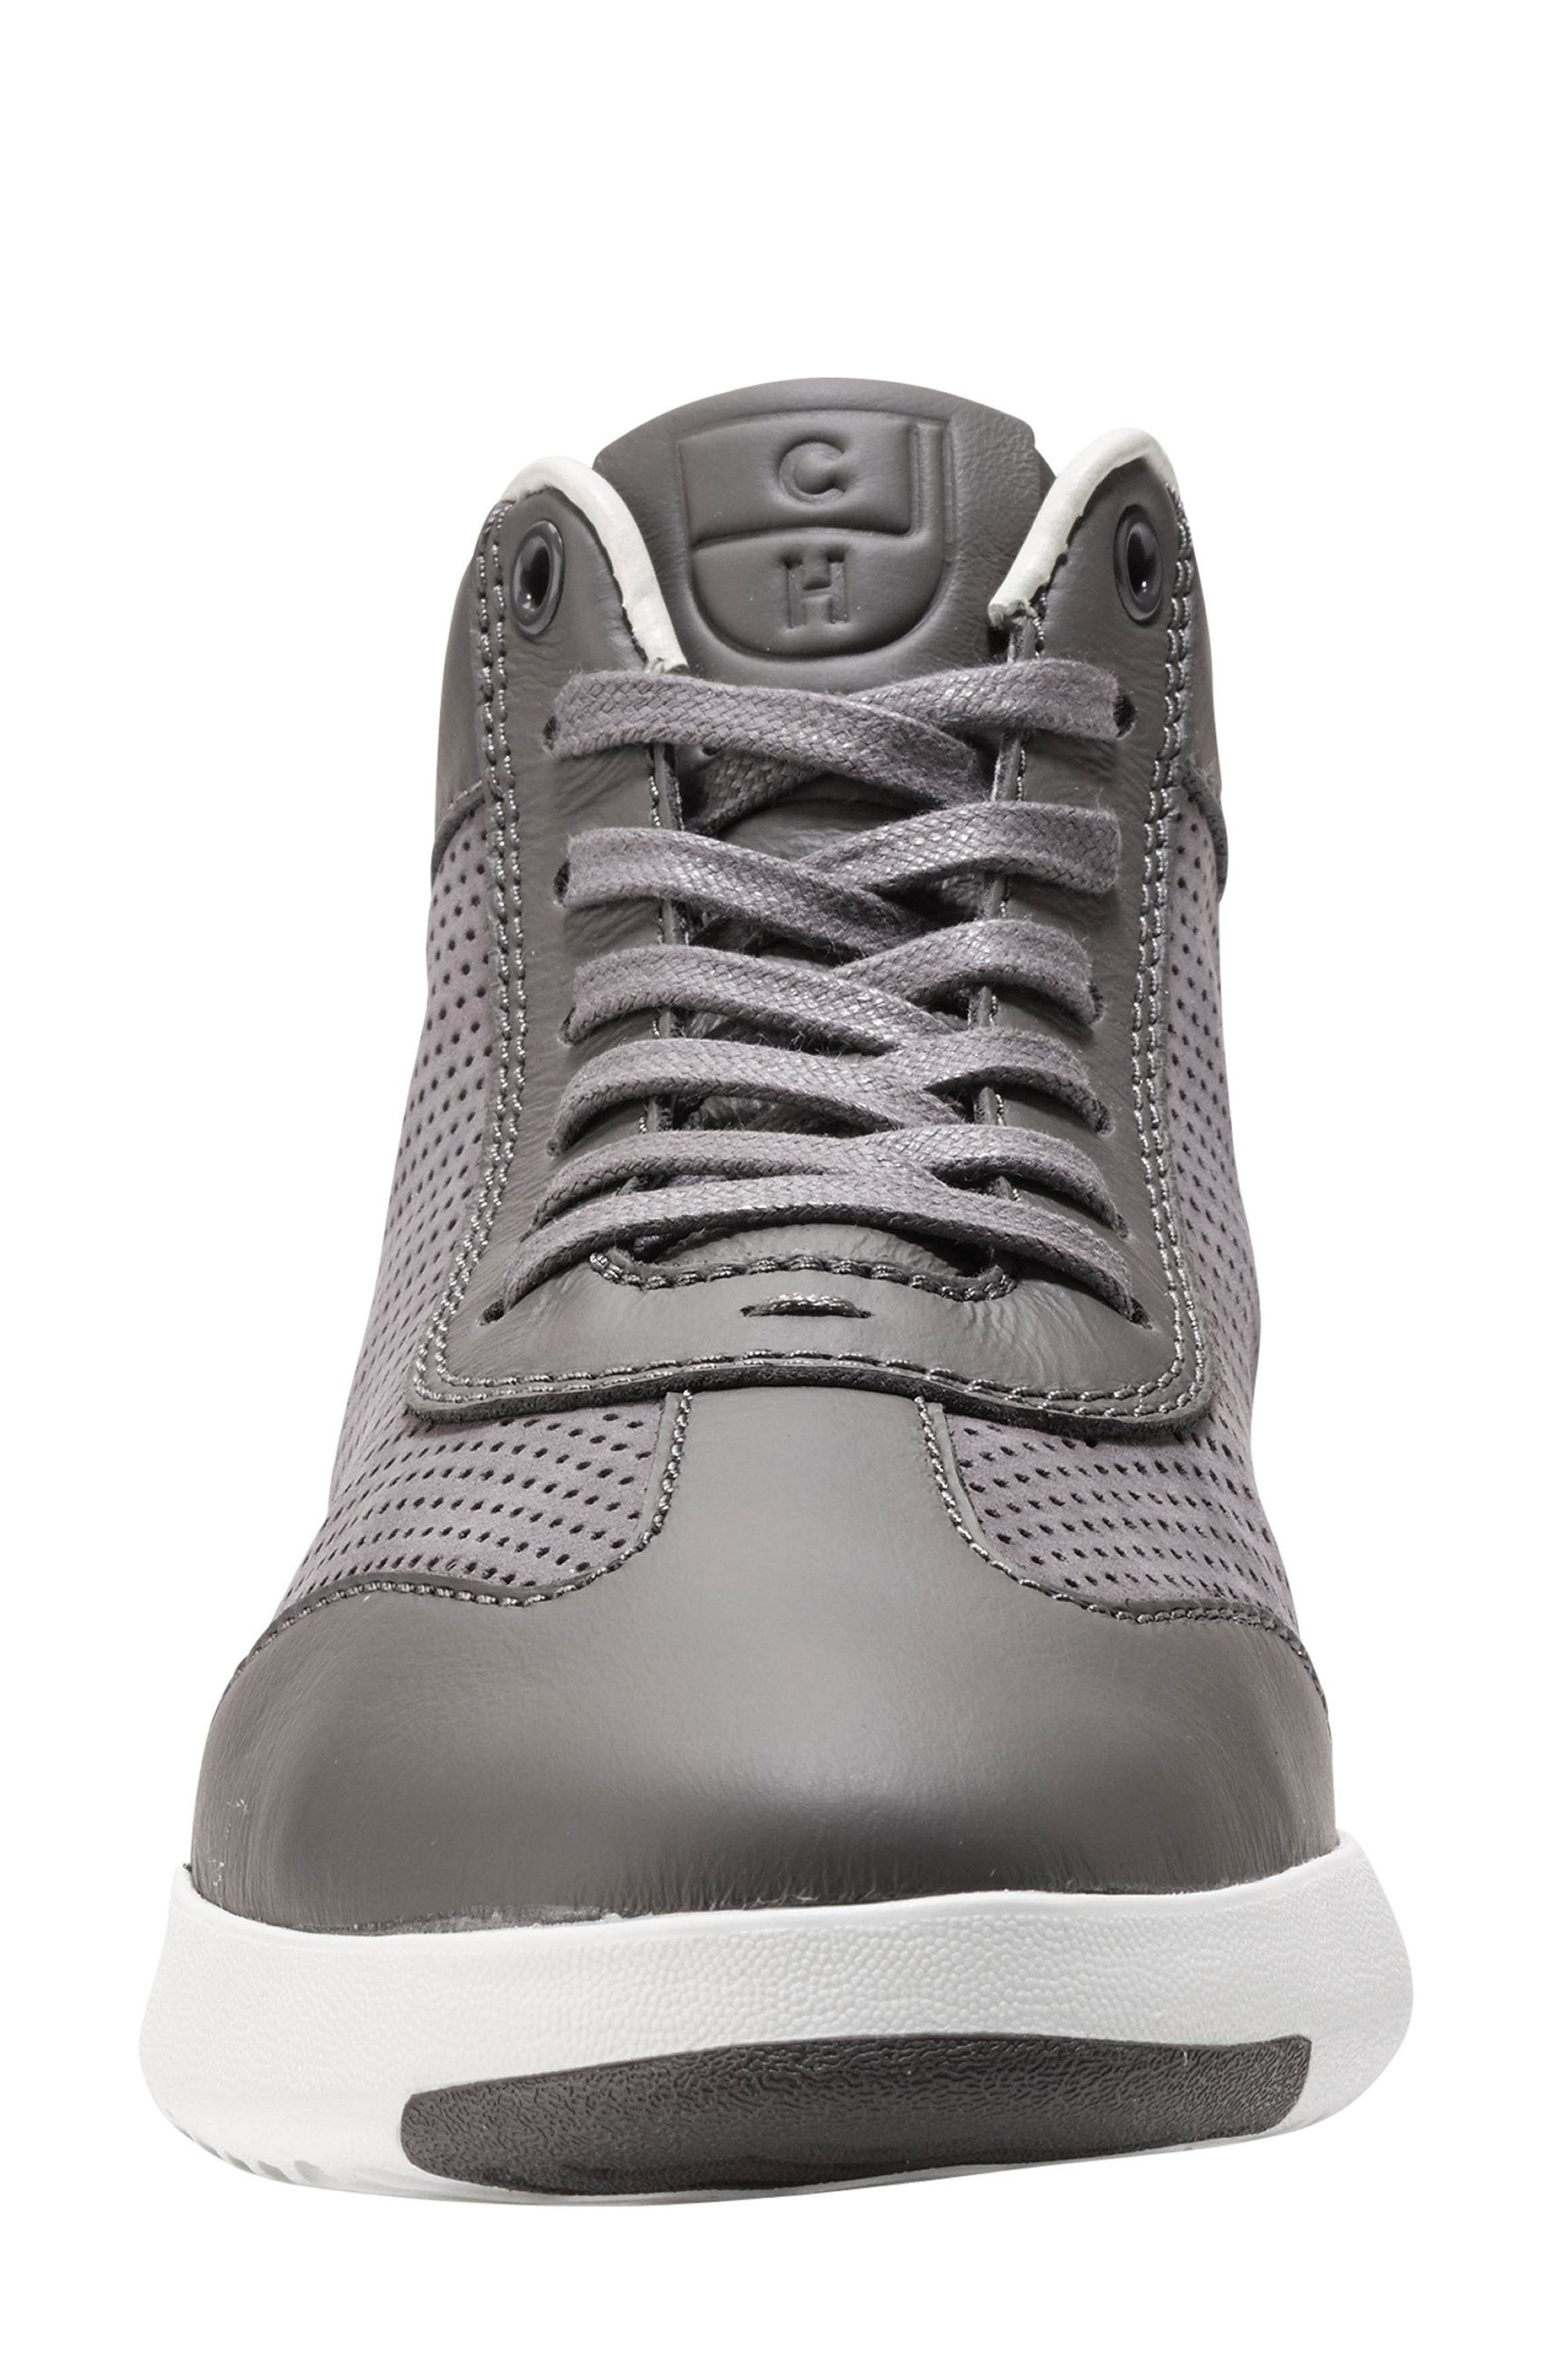 GrandPro High Top Sneaker,                             Alternate thumbnail 3, color,                             025